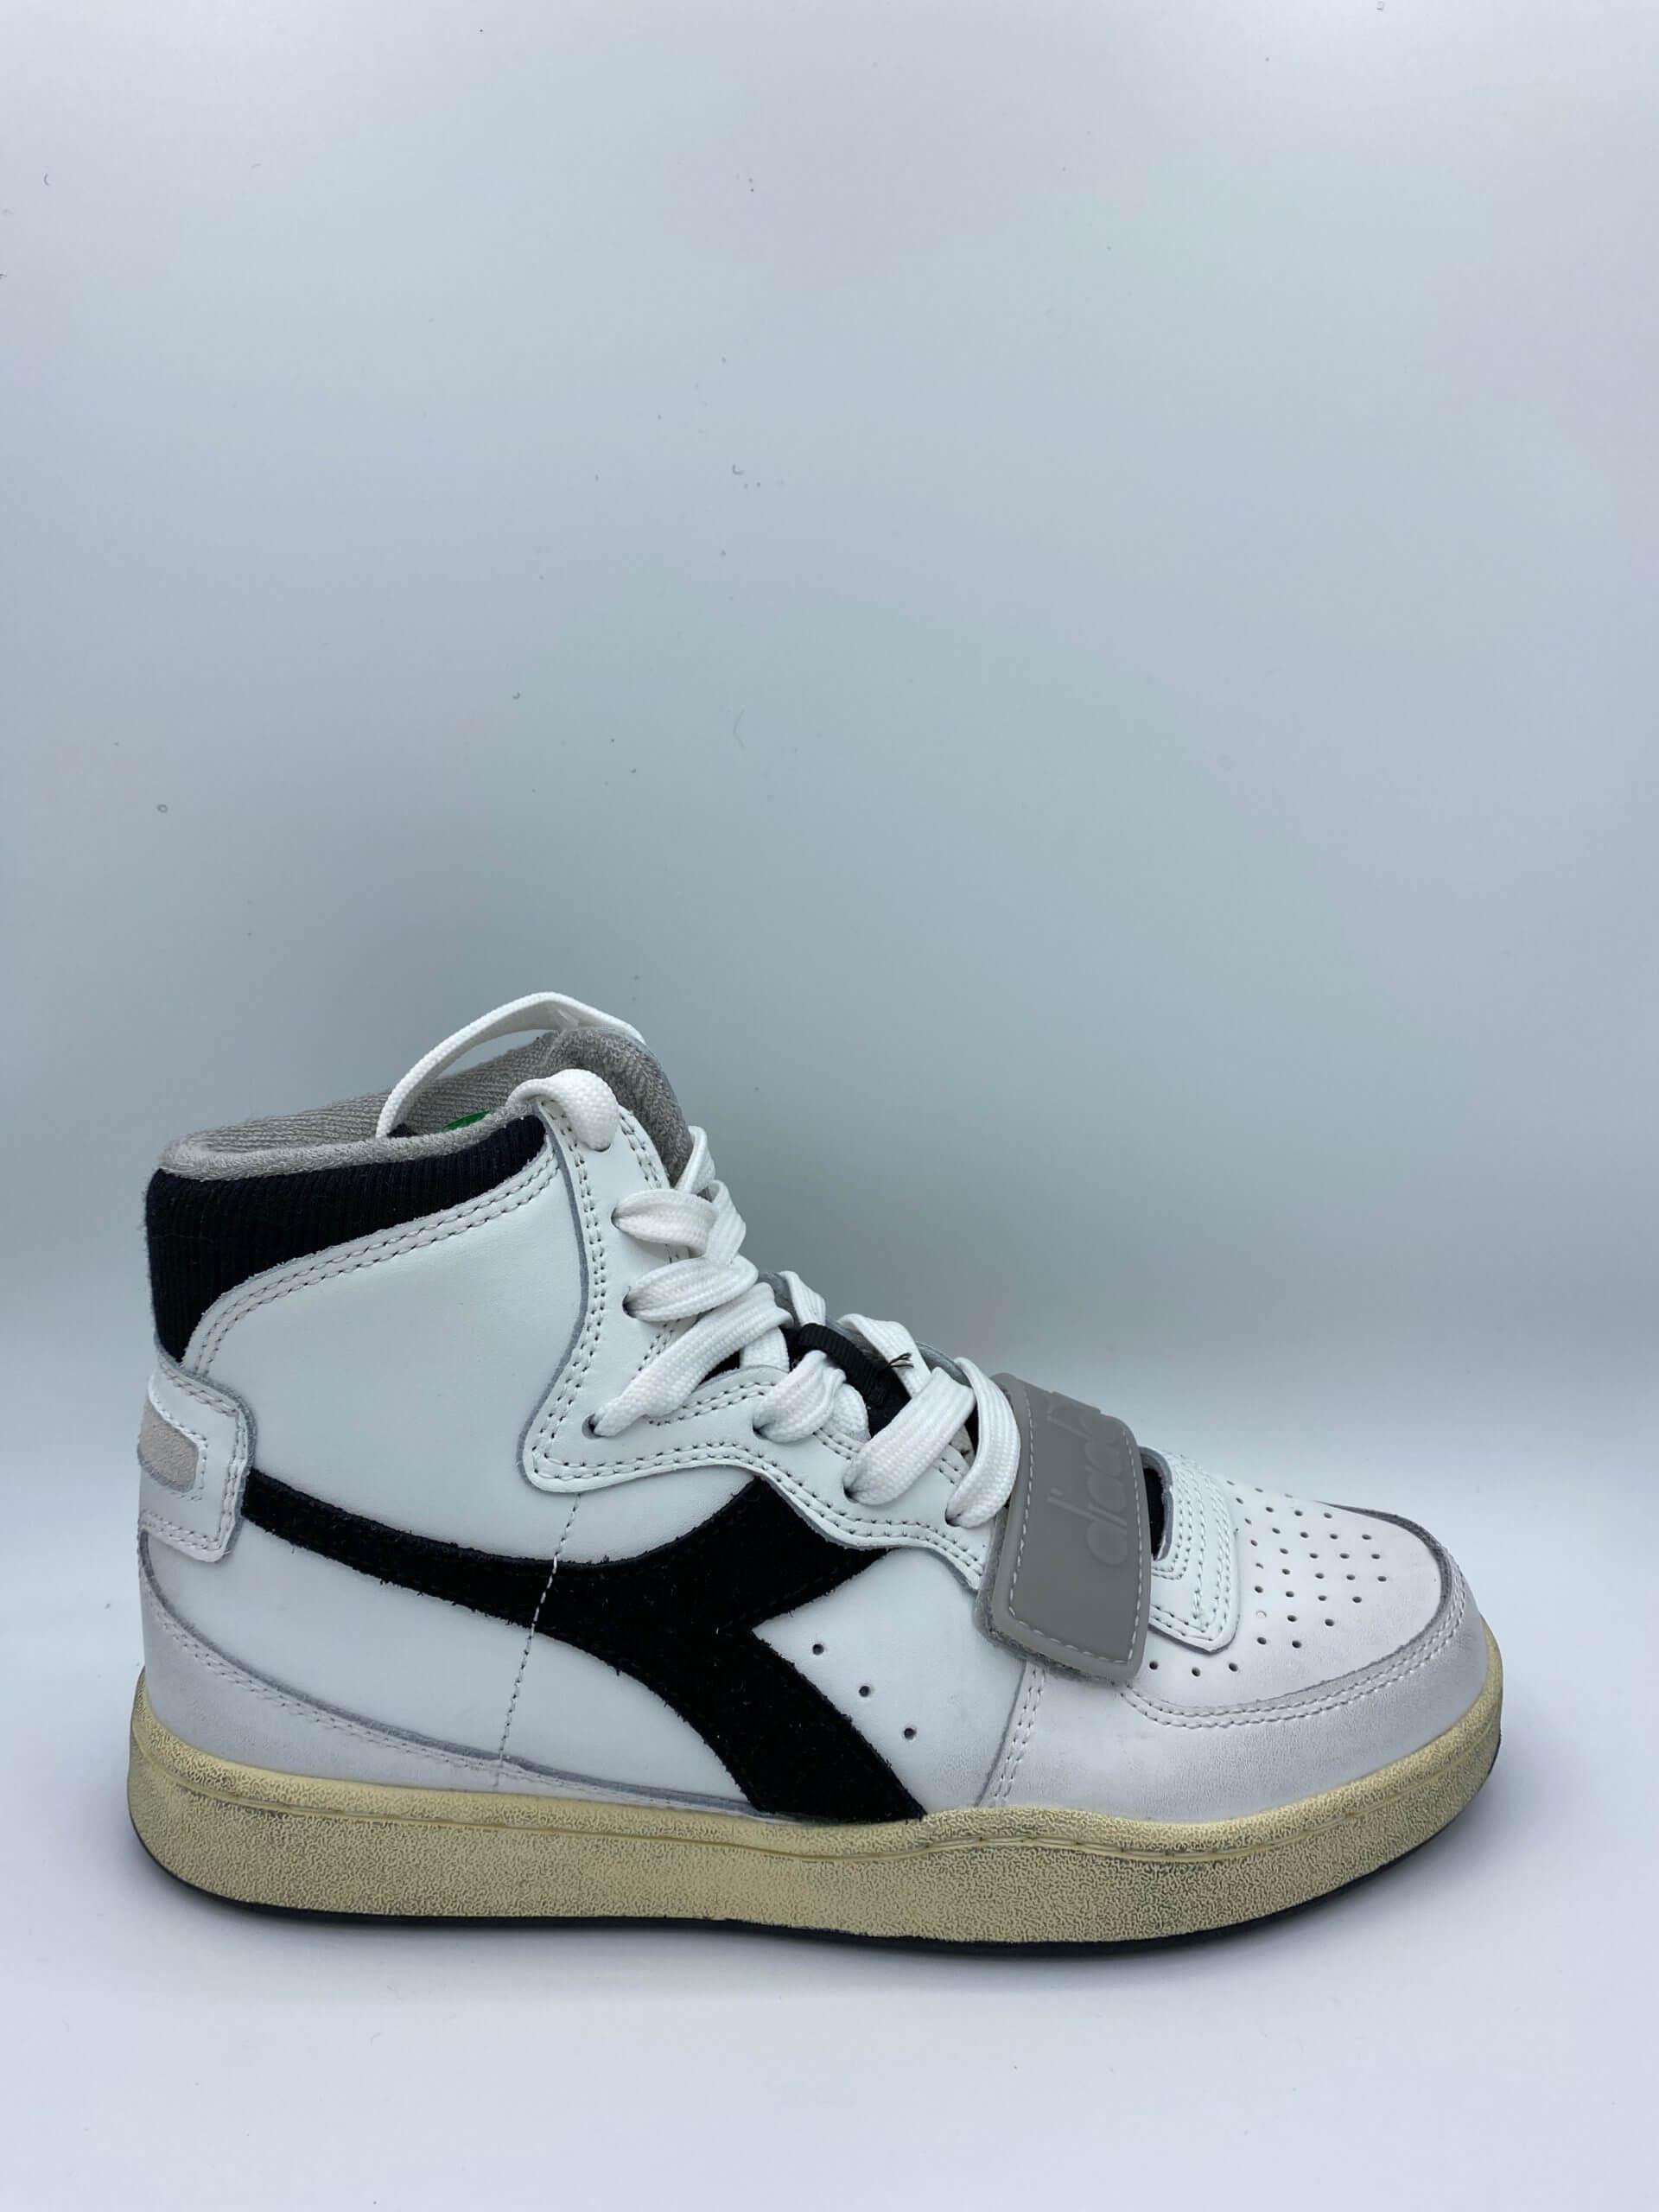 MI Basket Used High Black White